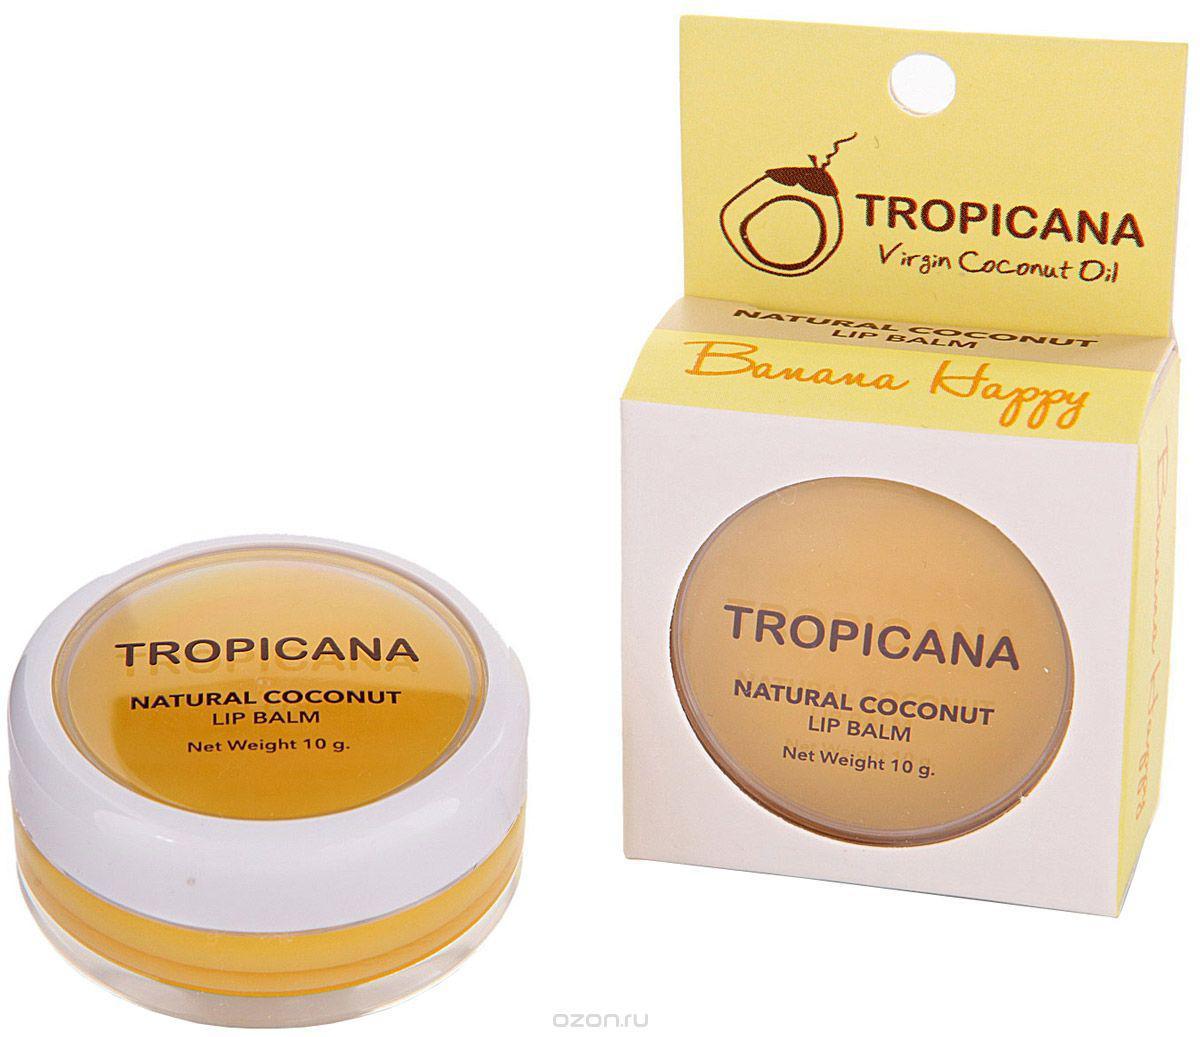 Бальзам для губ Щасливий Банан з кокосовим маслом Тропікана Virgin Coconut Oil Lip Balm Tropicana, 10 м